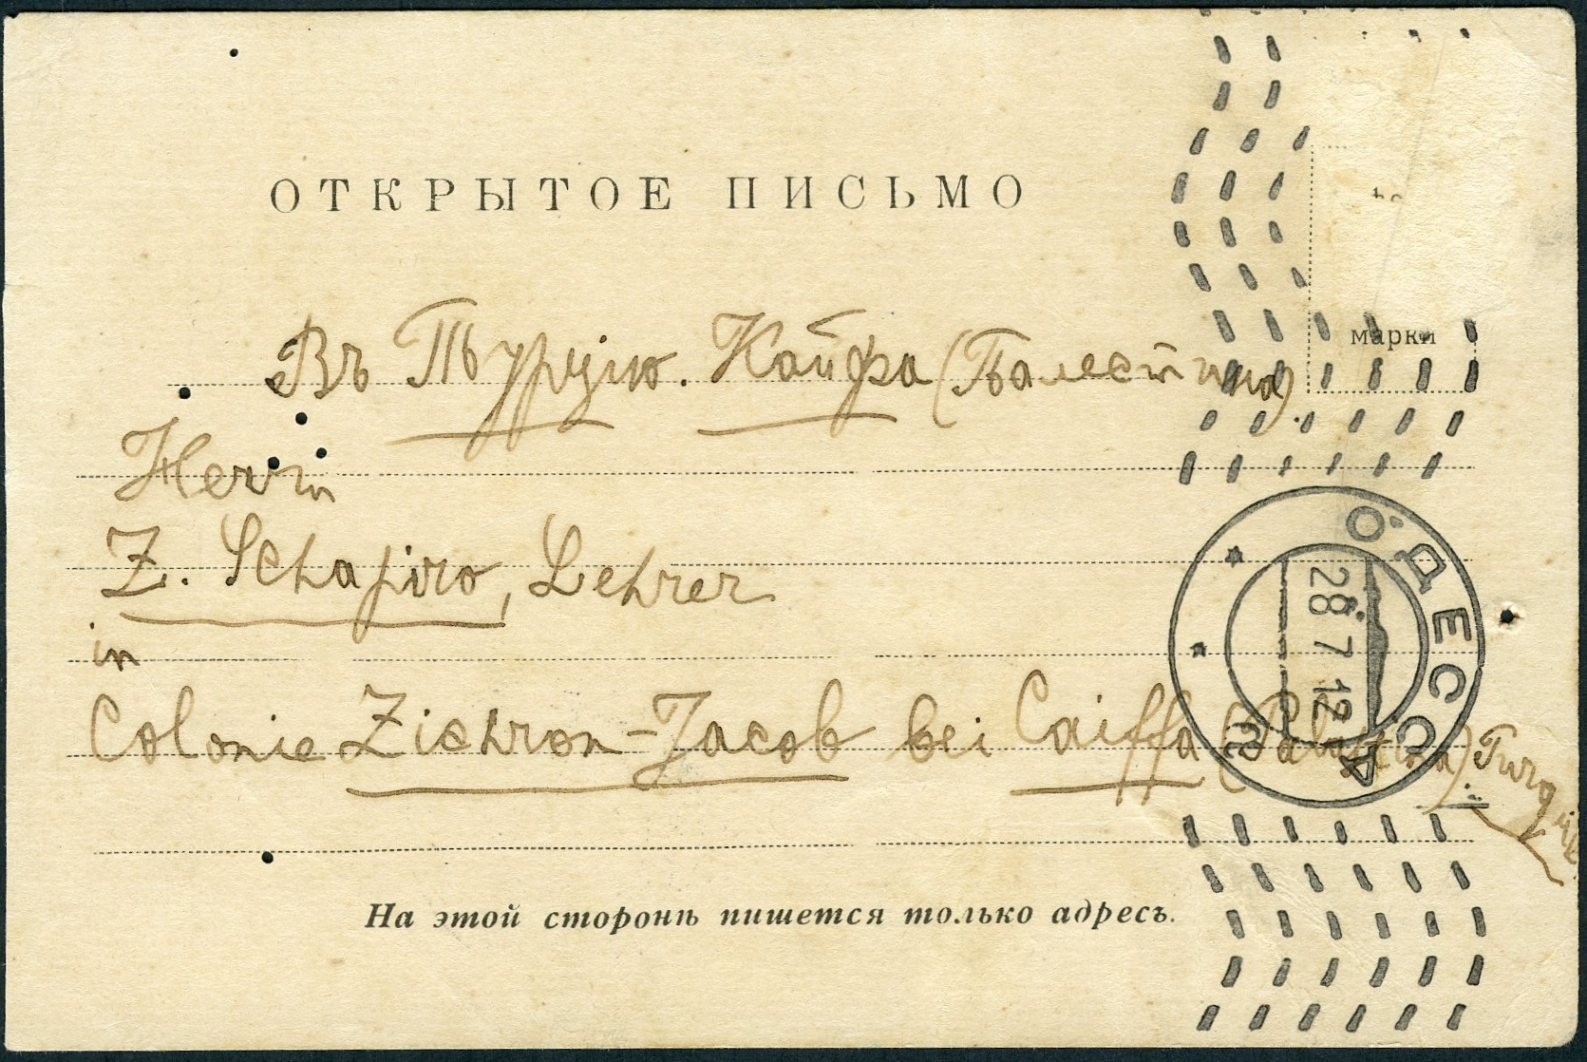 Lot 24 - PALESTINE FORERUNNERS AUSTRIAN POST  -  Tel Aviv Stamps Ltd. Auction #50